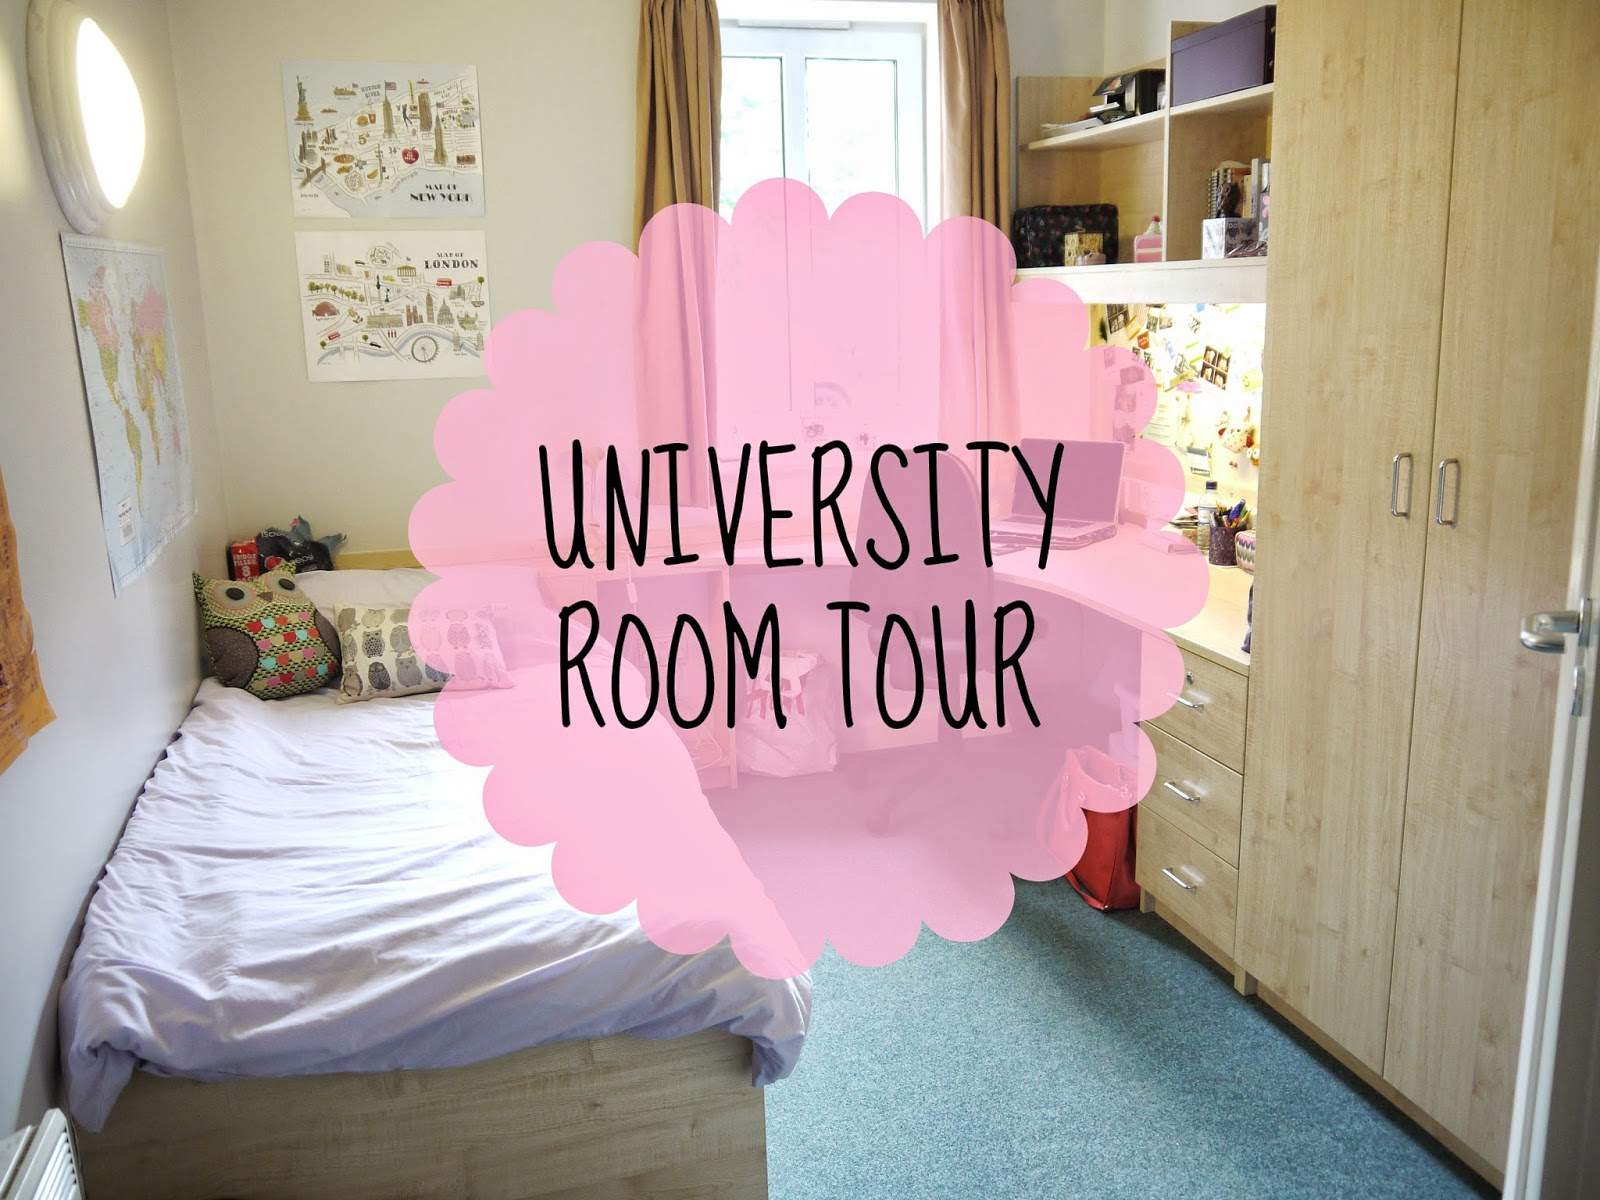 university room tour